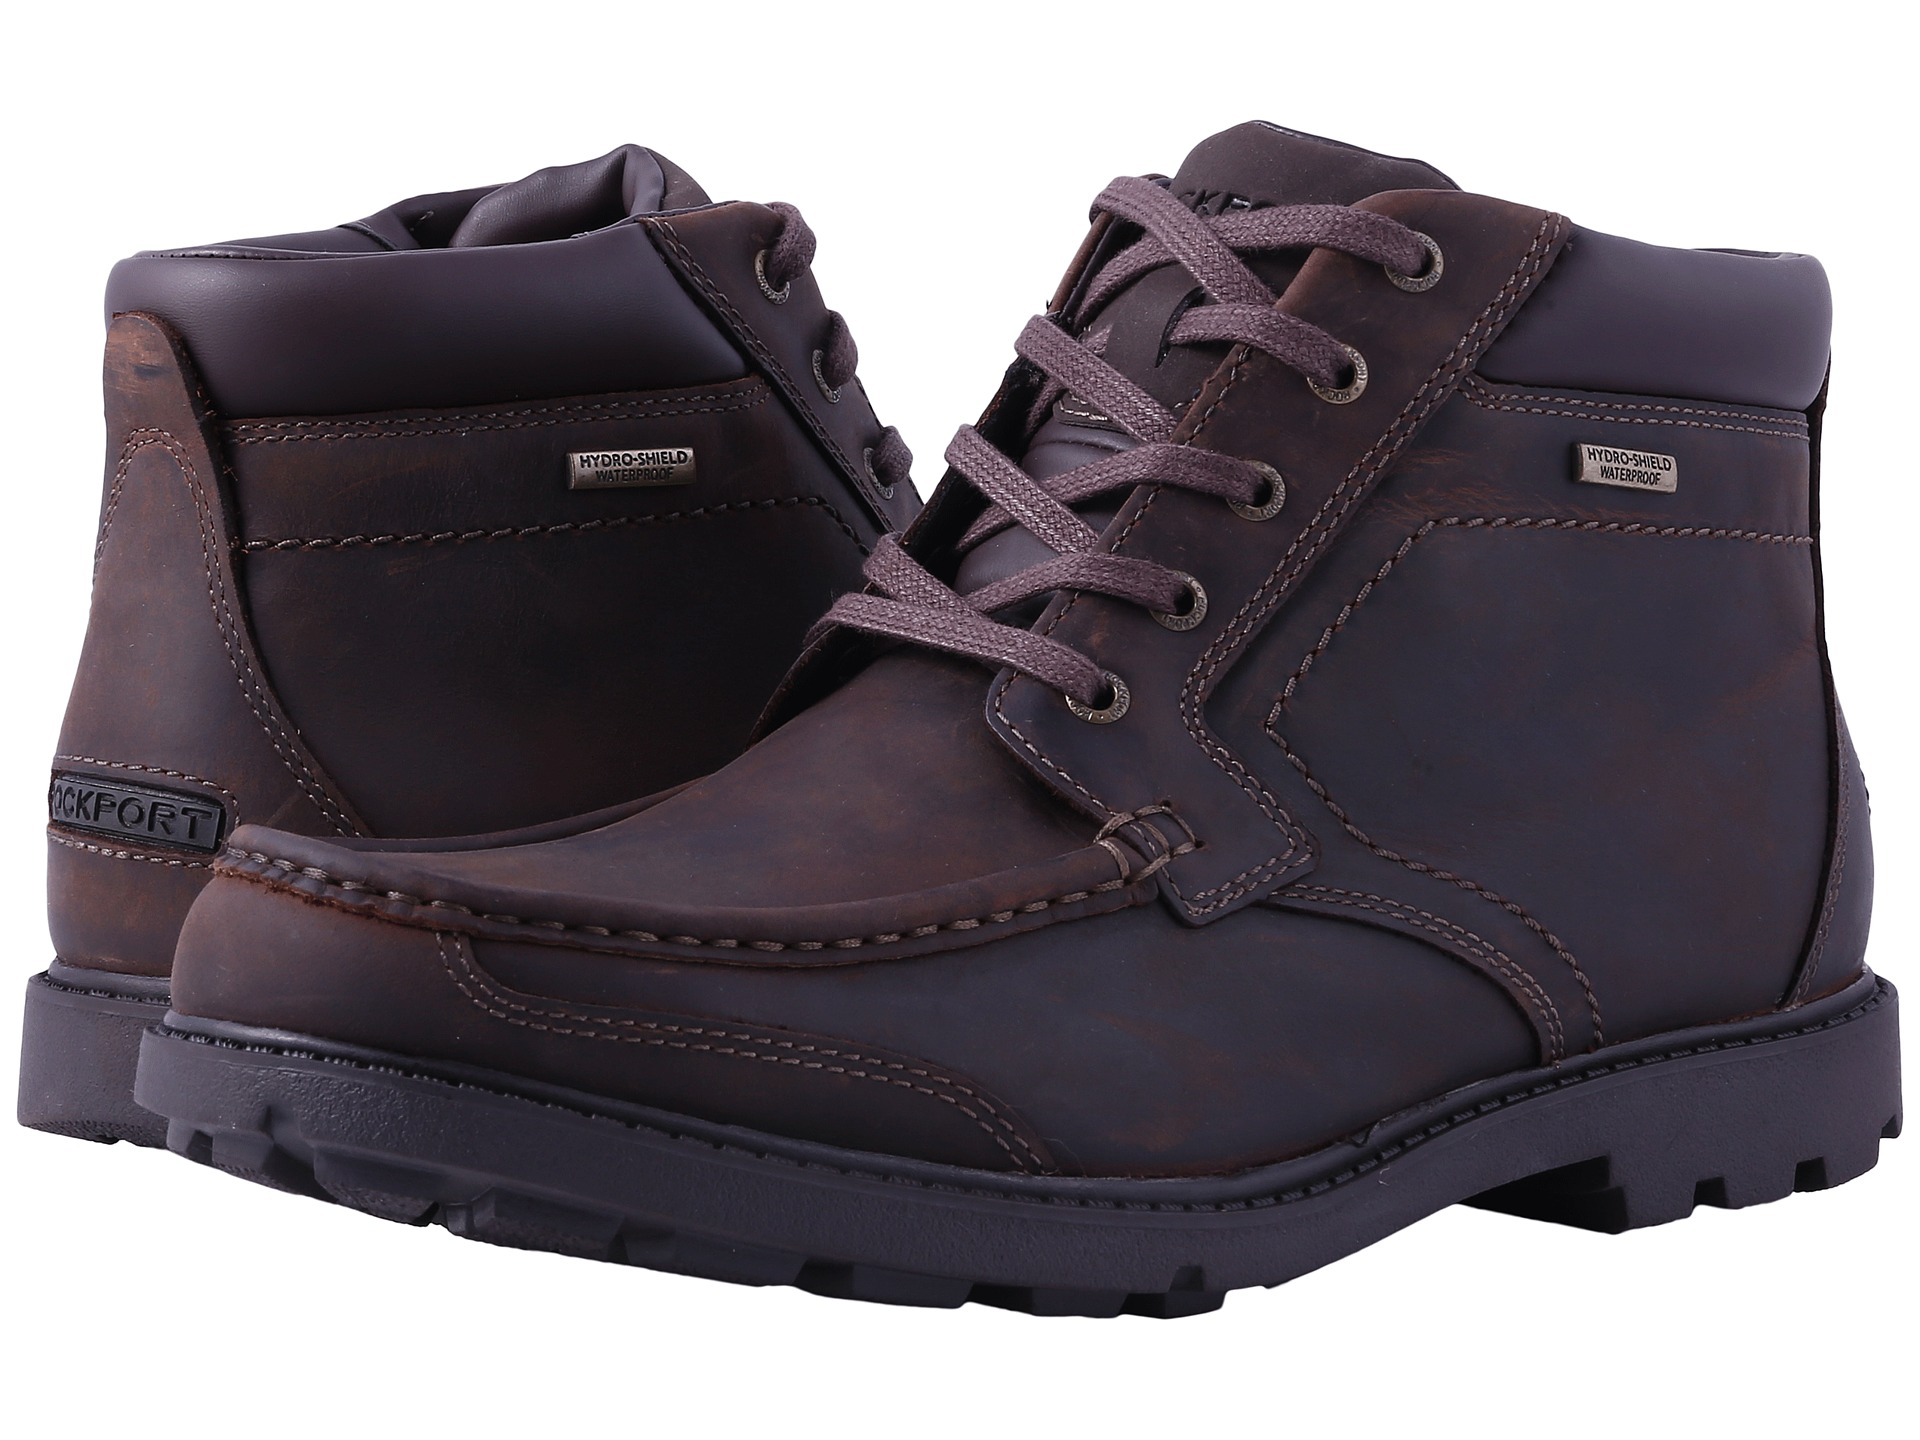 Rockport Rugged Bucks Moc Boot Waterproof At Zappos Com